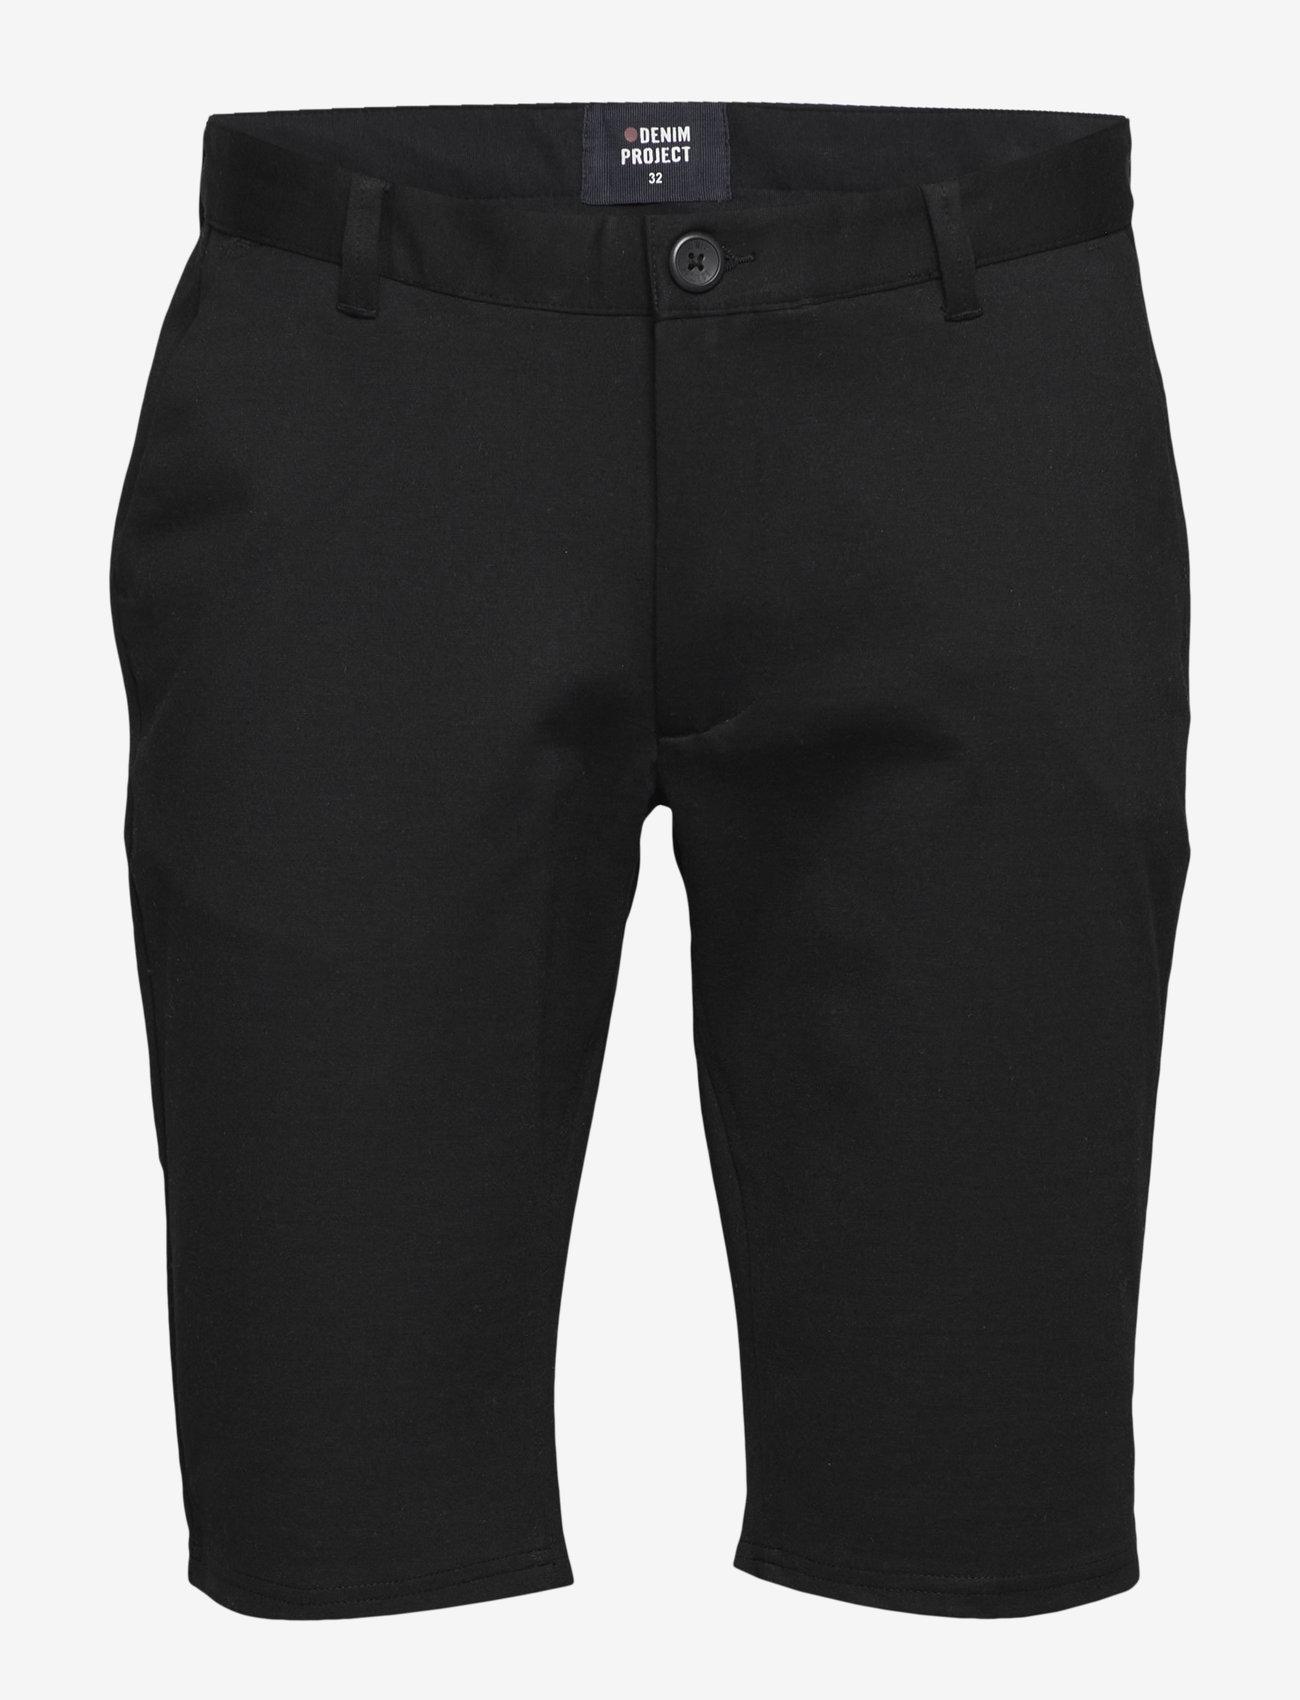 Denim project - Ponte Shorts - chinos shorts - black - 0